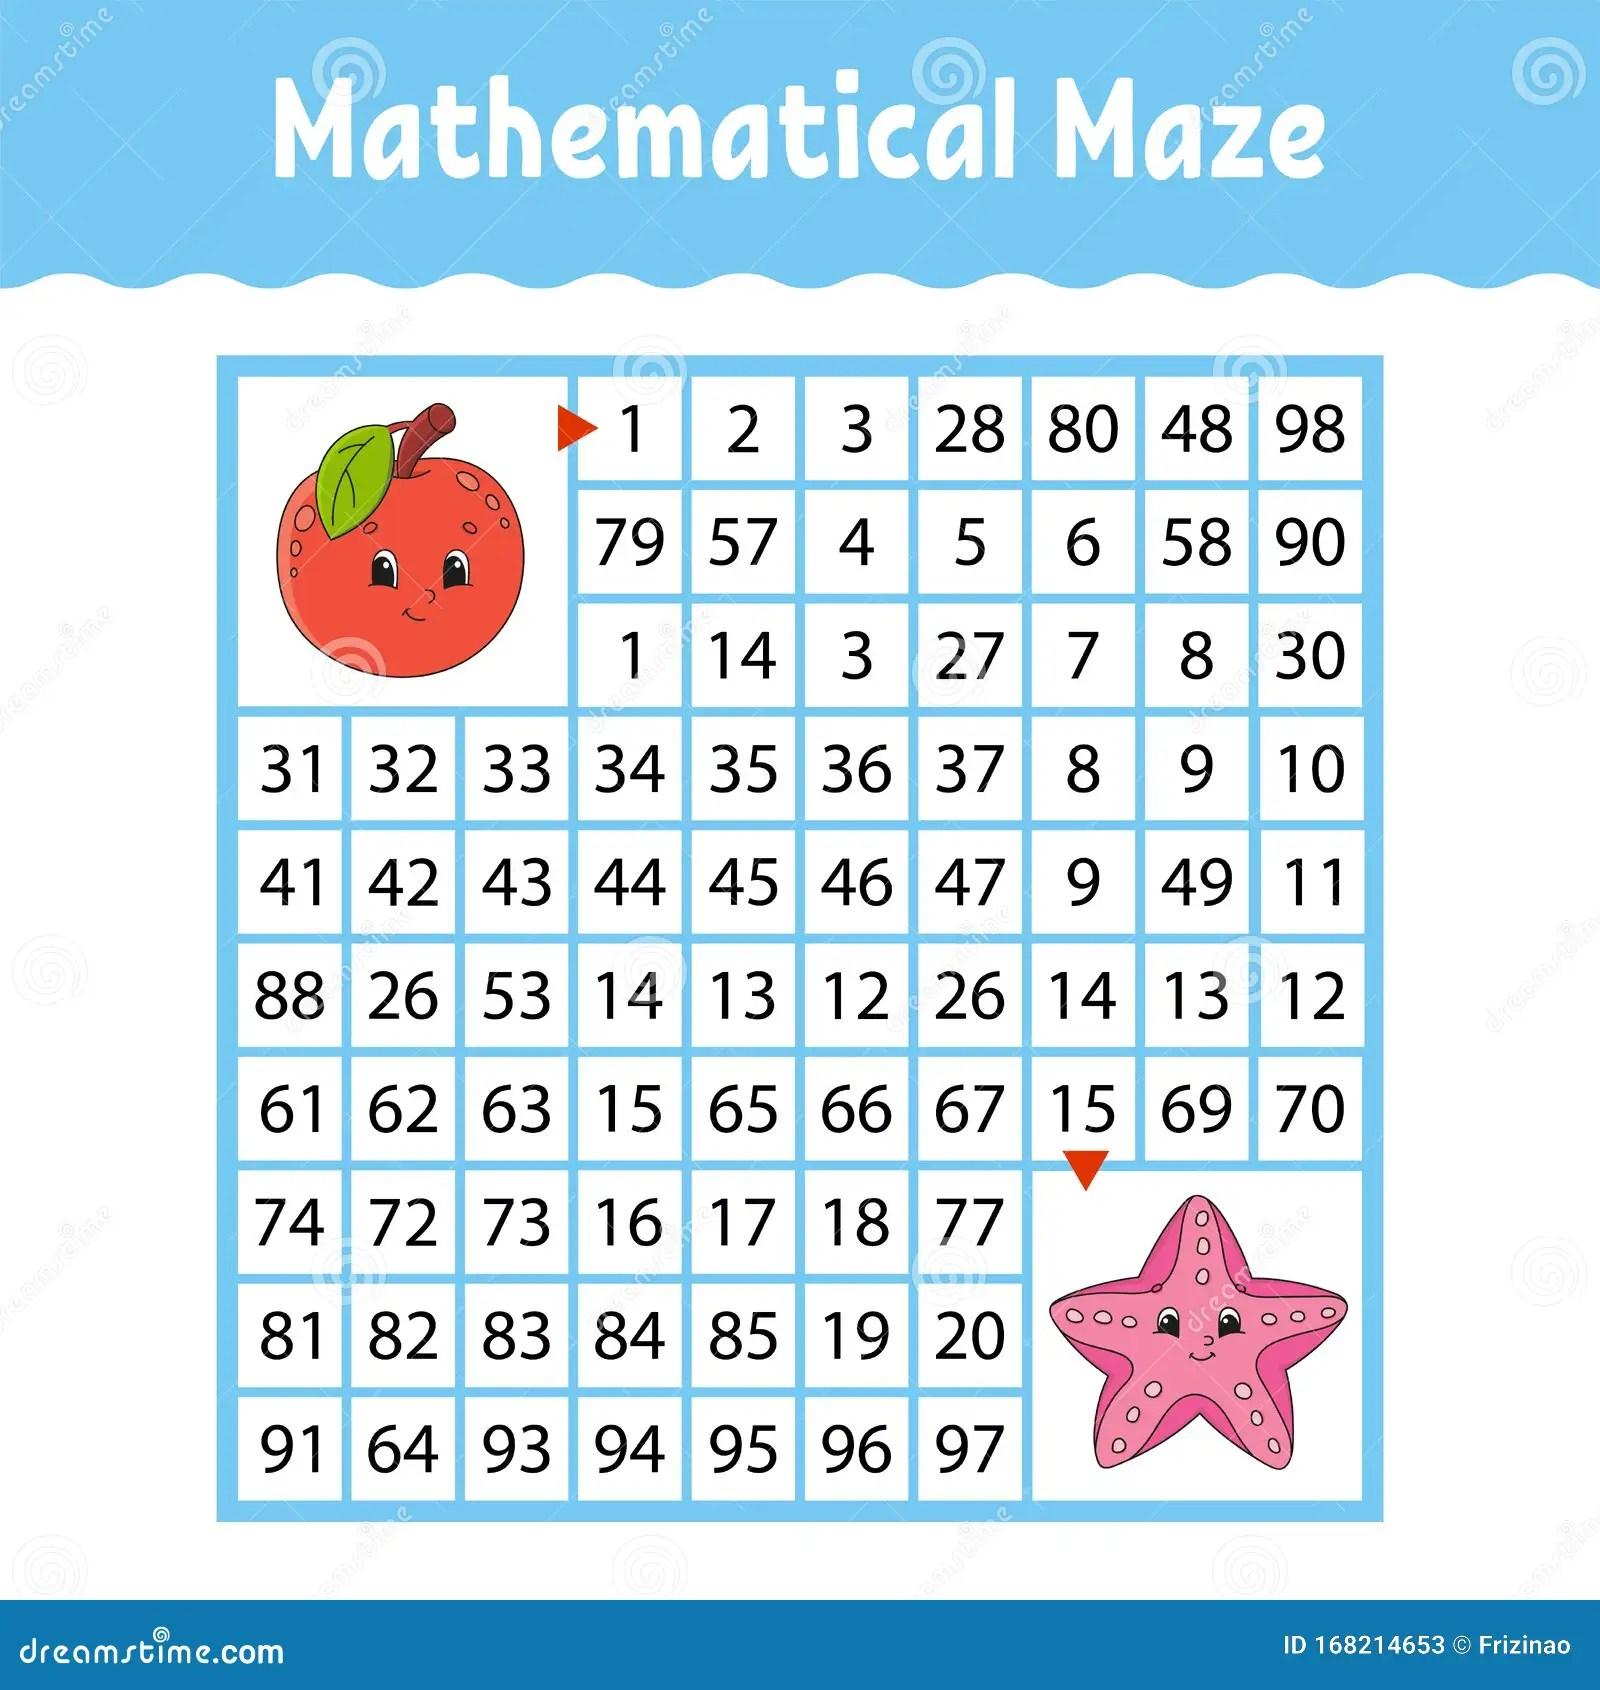 Fruit Apple Sea Starfish Mathematical Square Maze Game